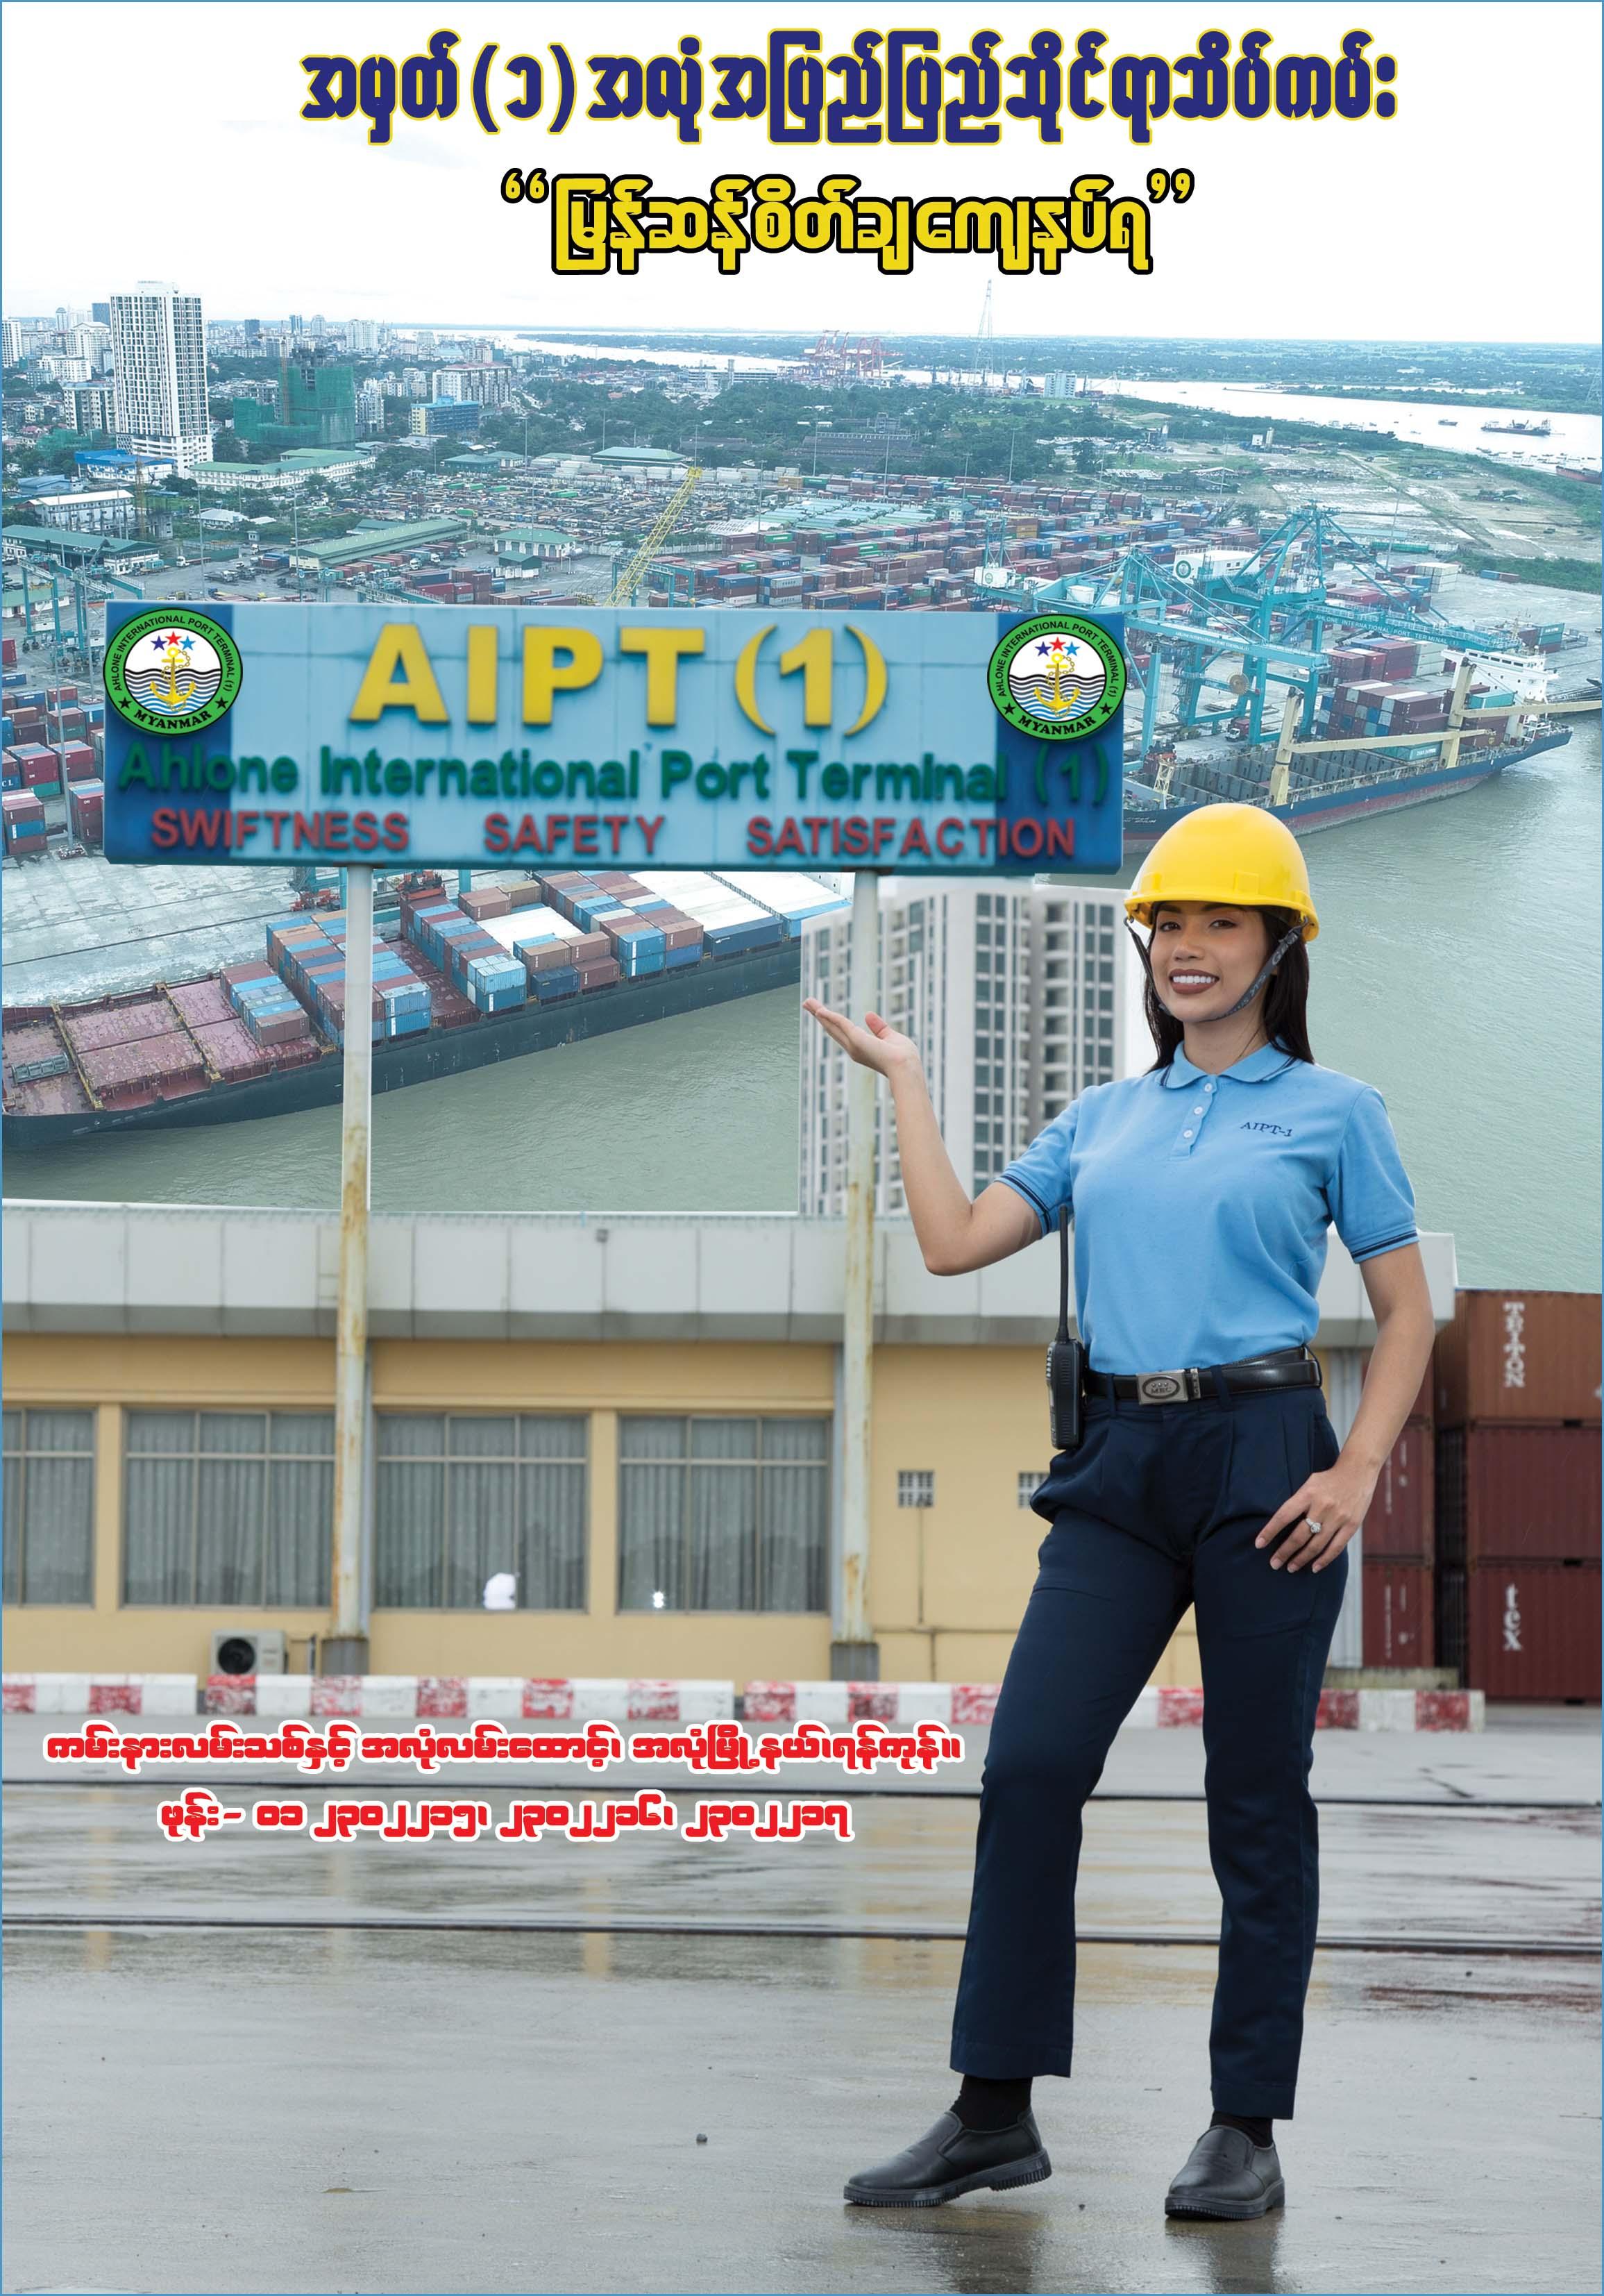 Ahlone International Port Terminal (1) (AIPT)